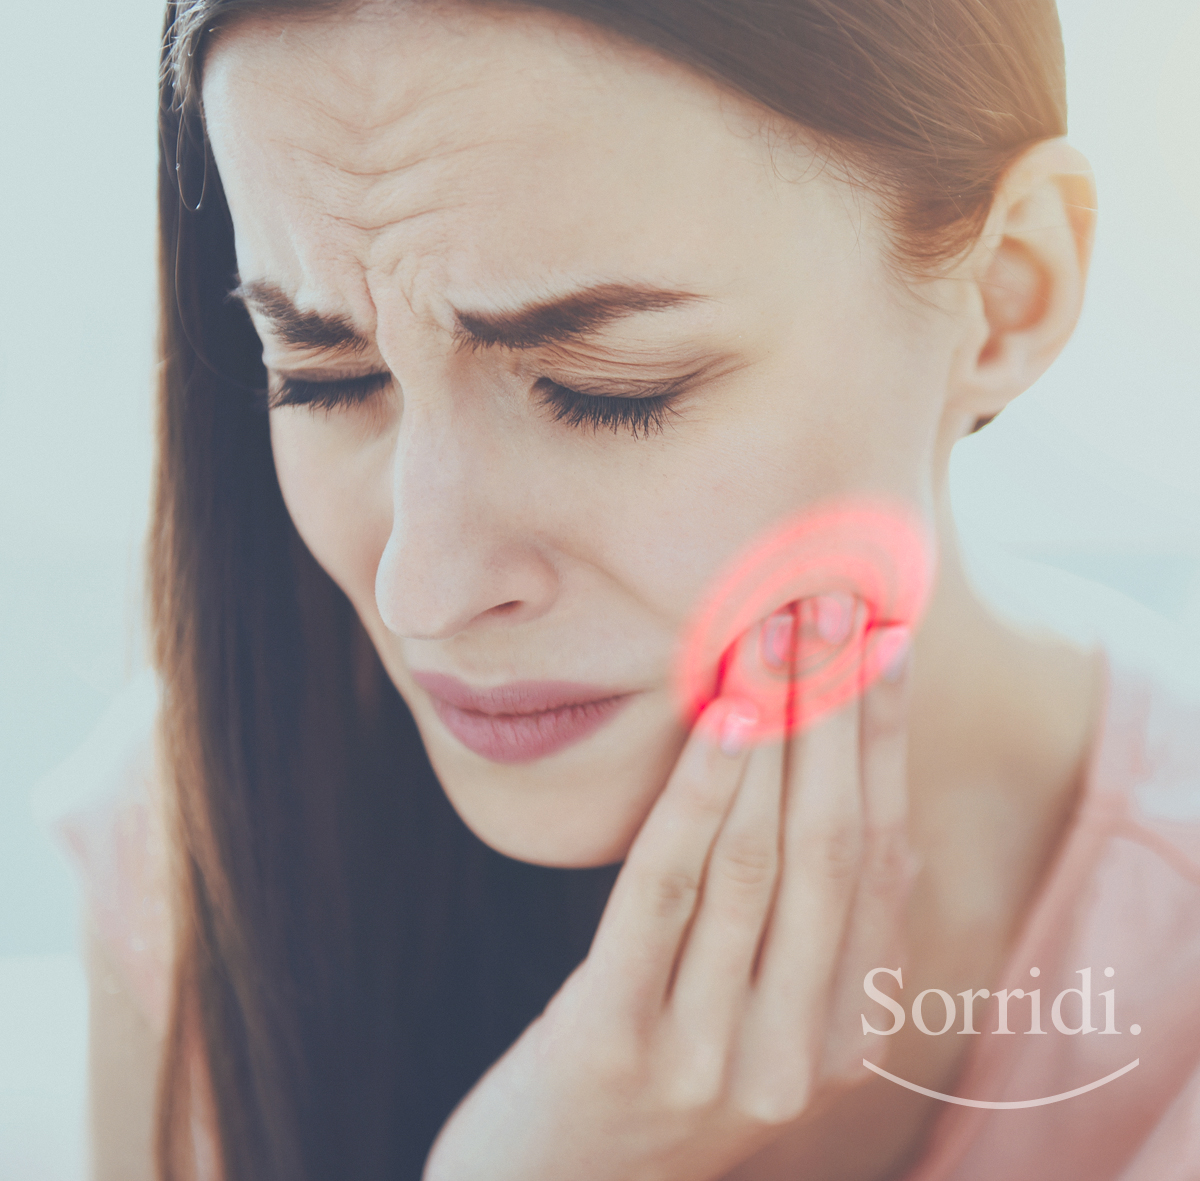 Mal di denti. Soluzioni e rimendi